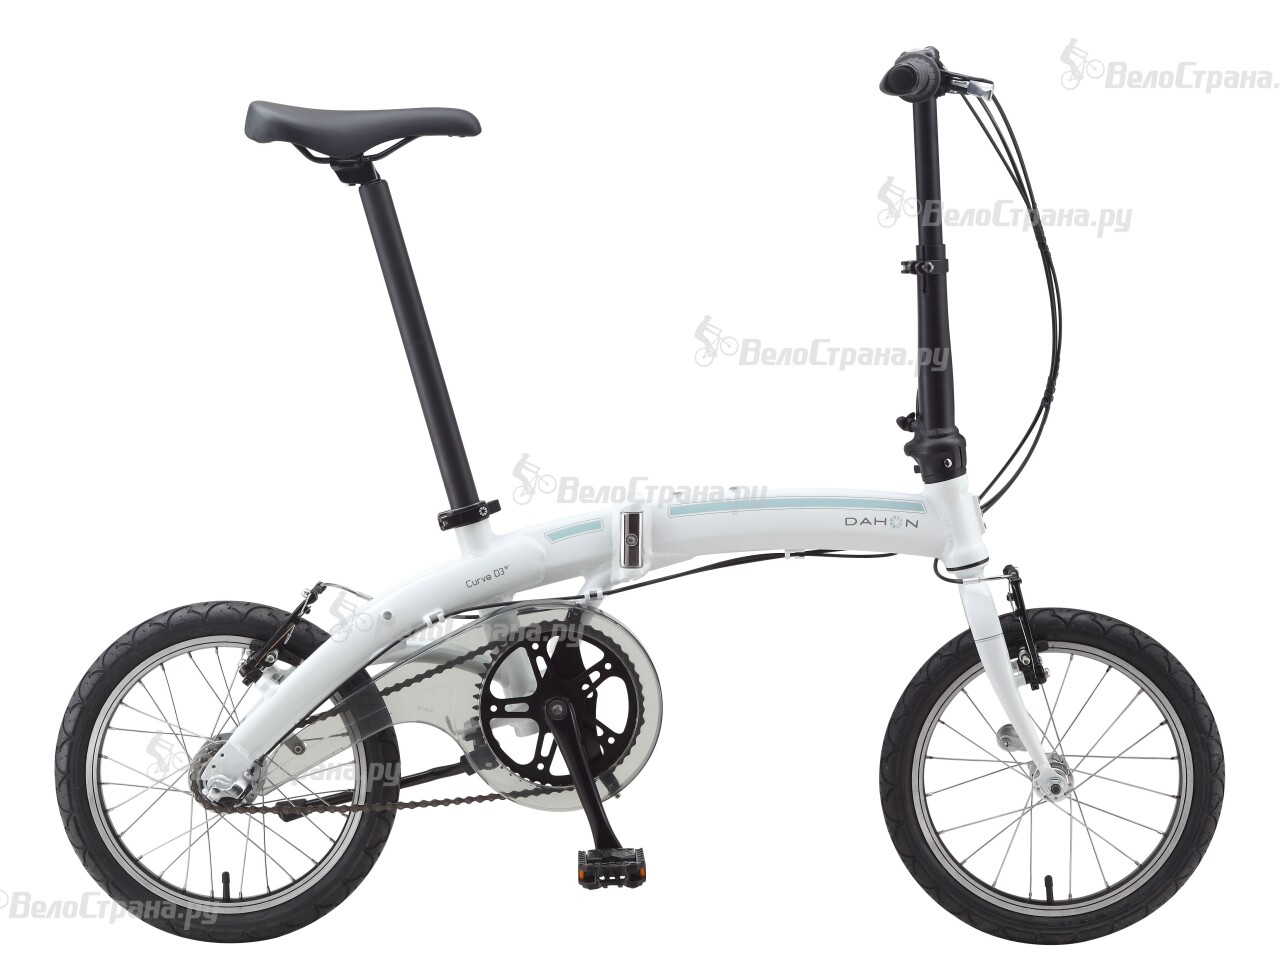 Велосипед Dahon Curve i3 16'' (2015) велосипед dahon vybe d7 u 2017